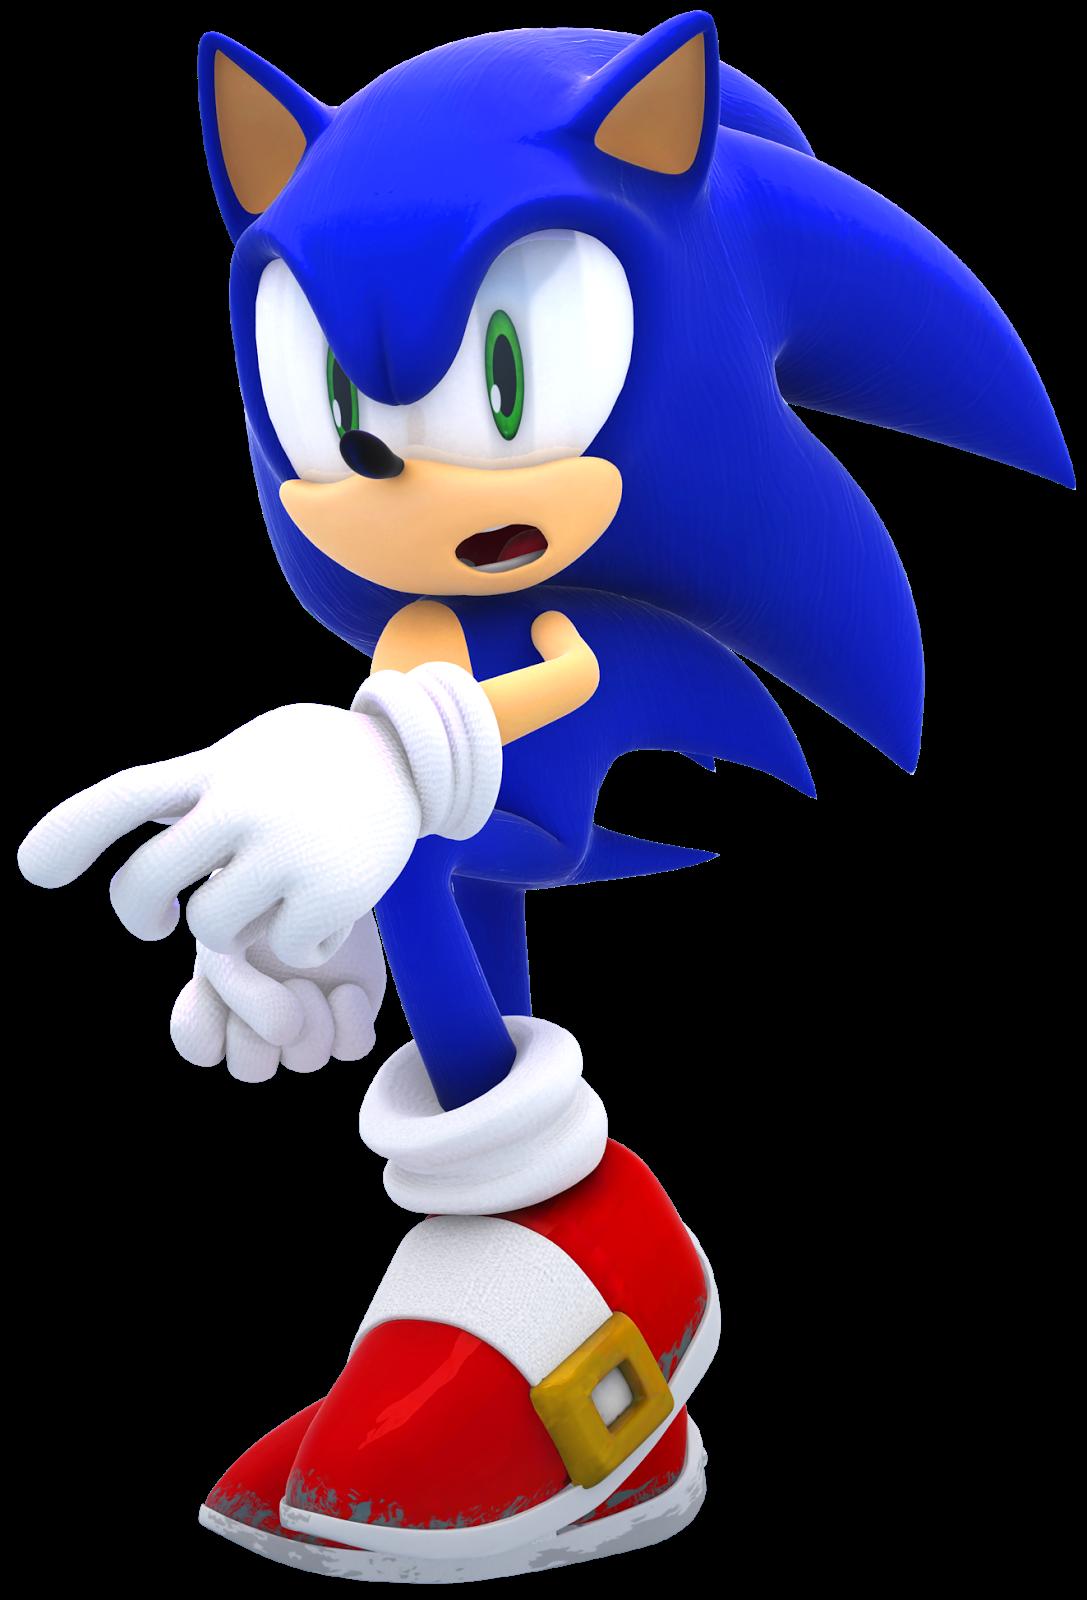 sonic the hedgehog - photo #2